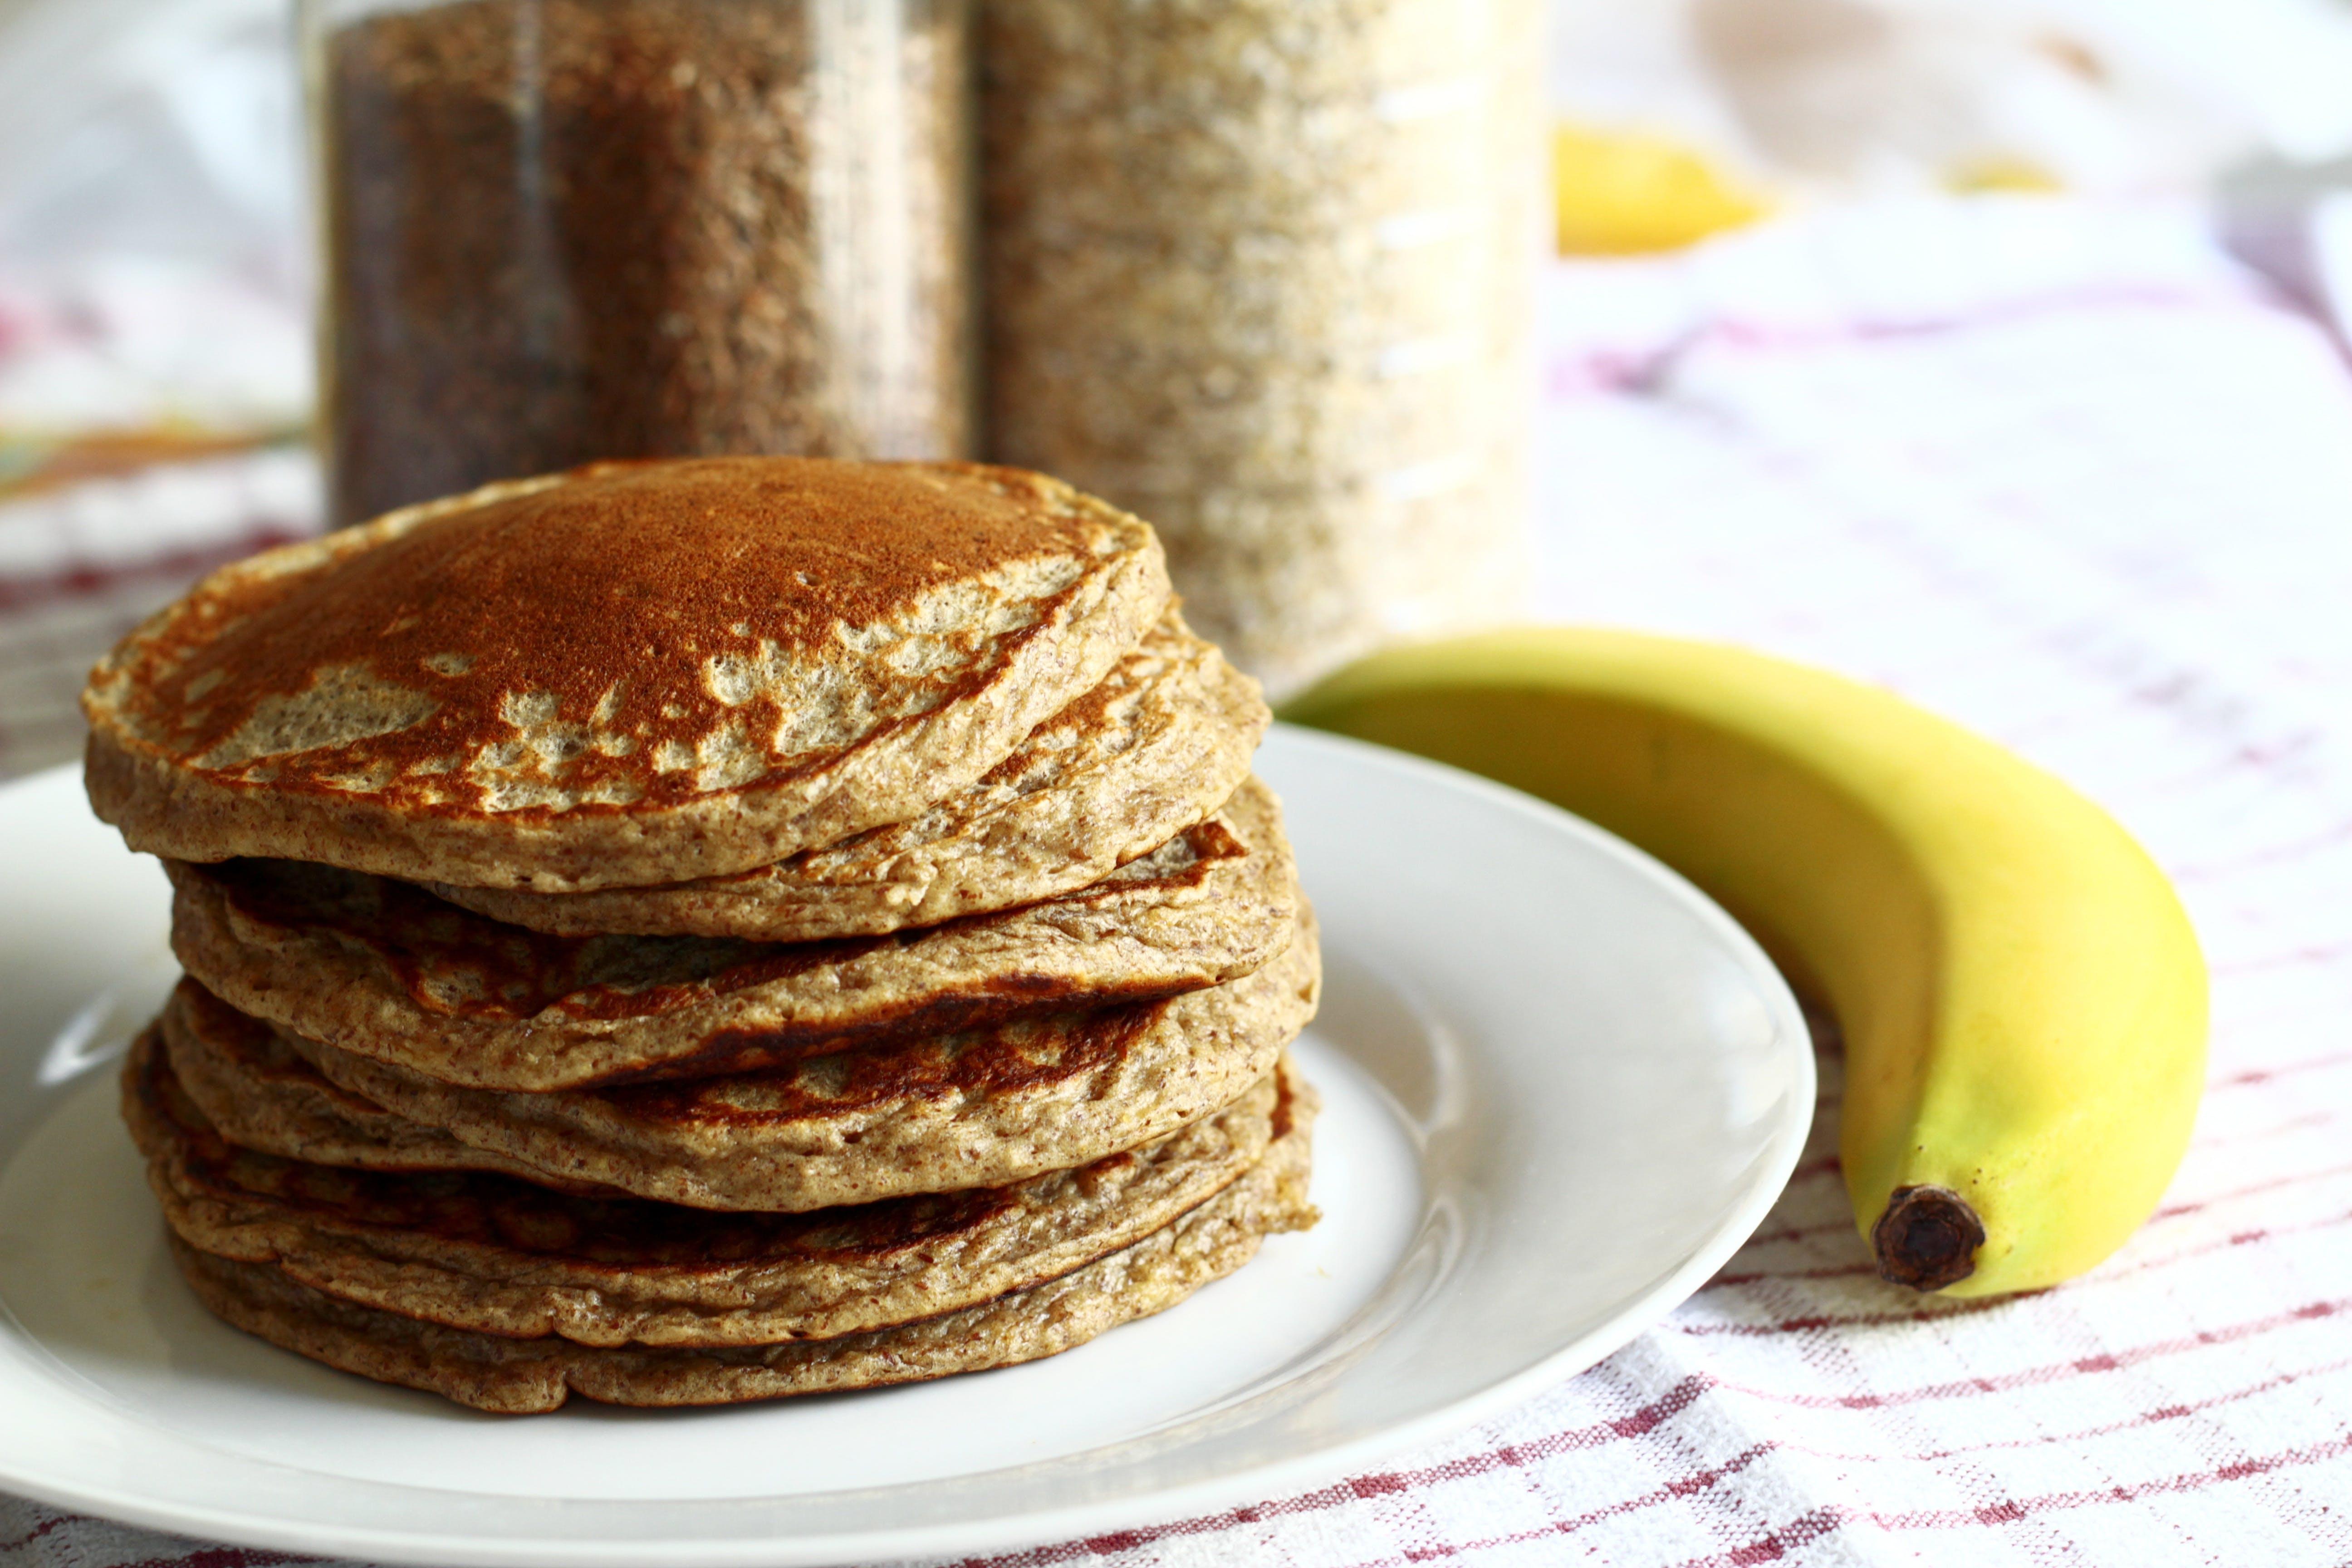 Pancakes and Ripe Banana